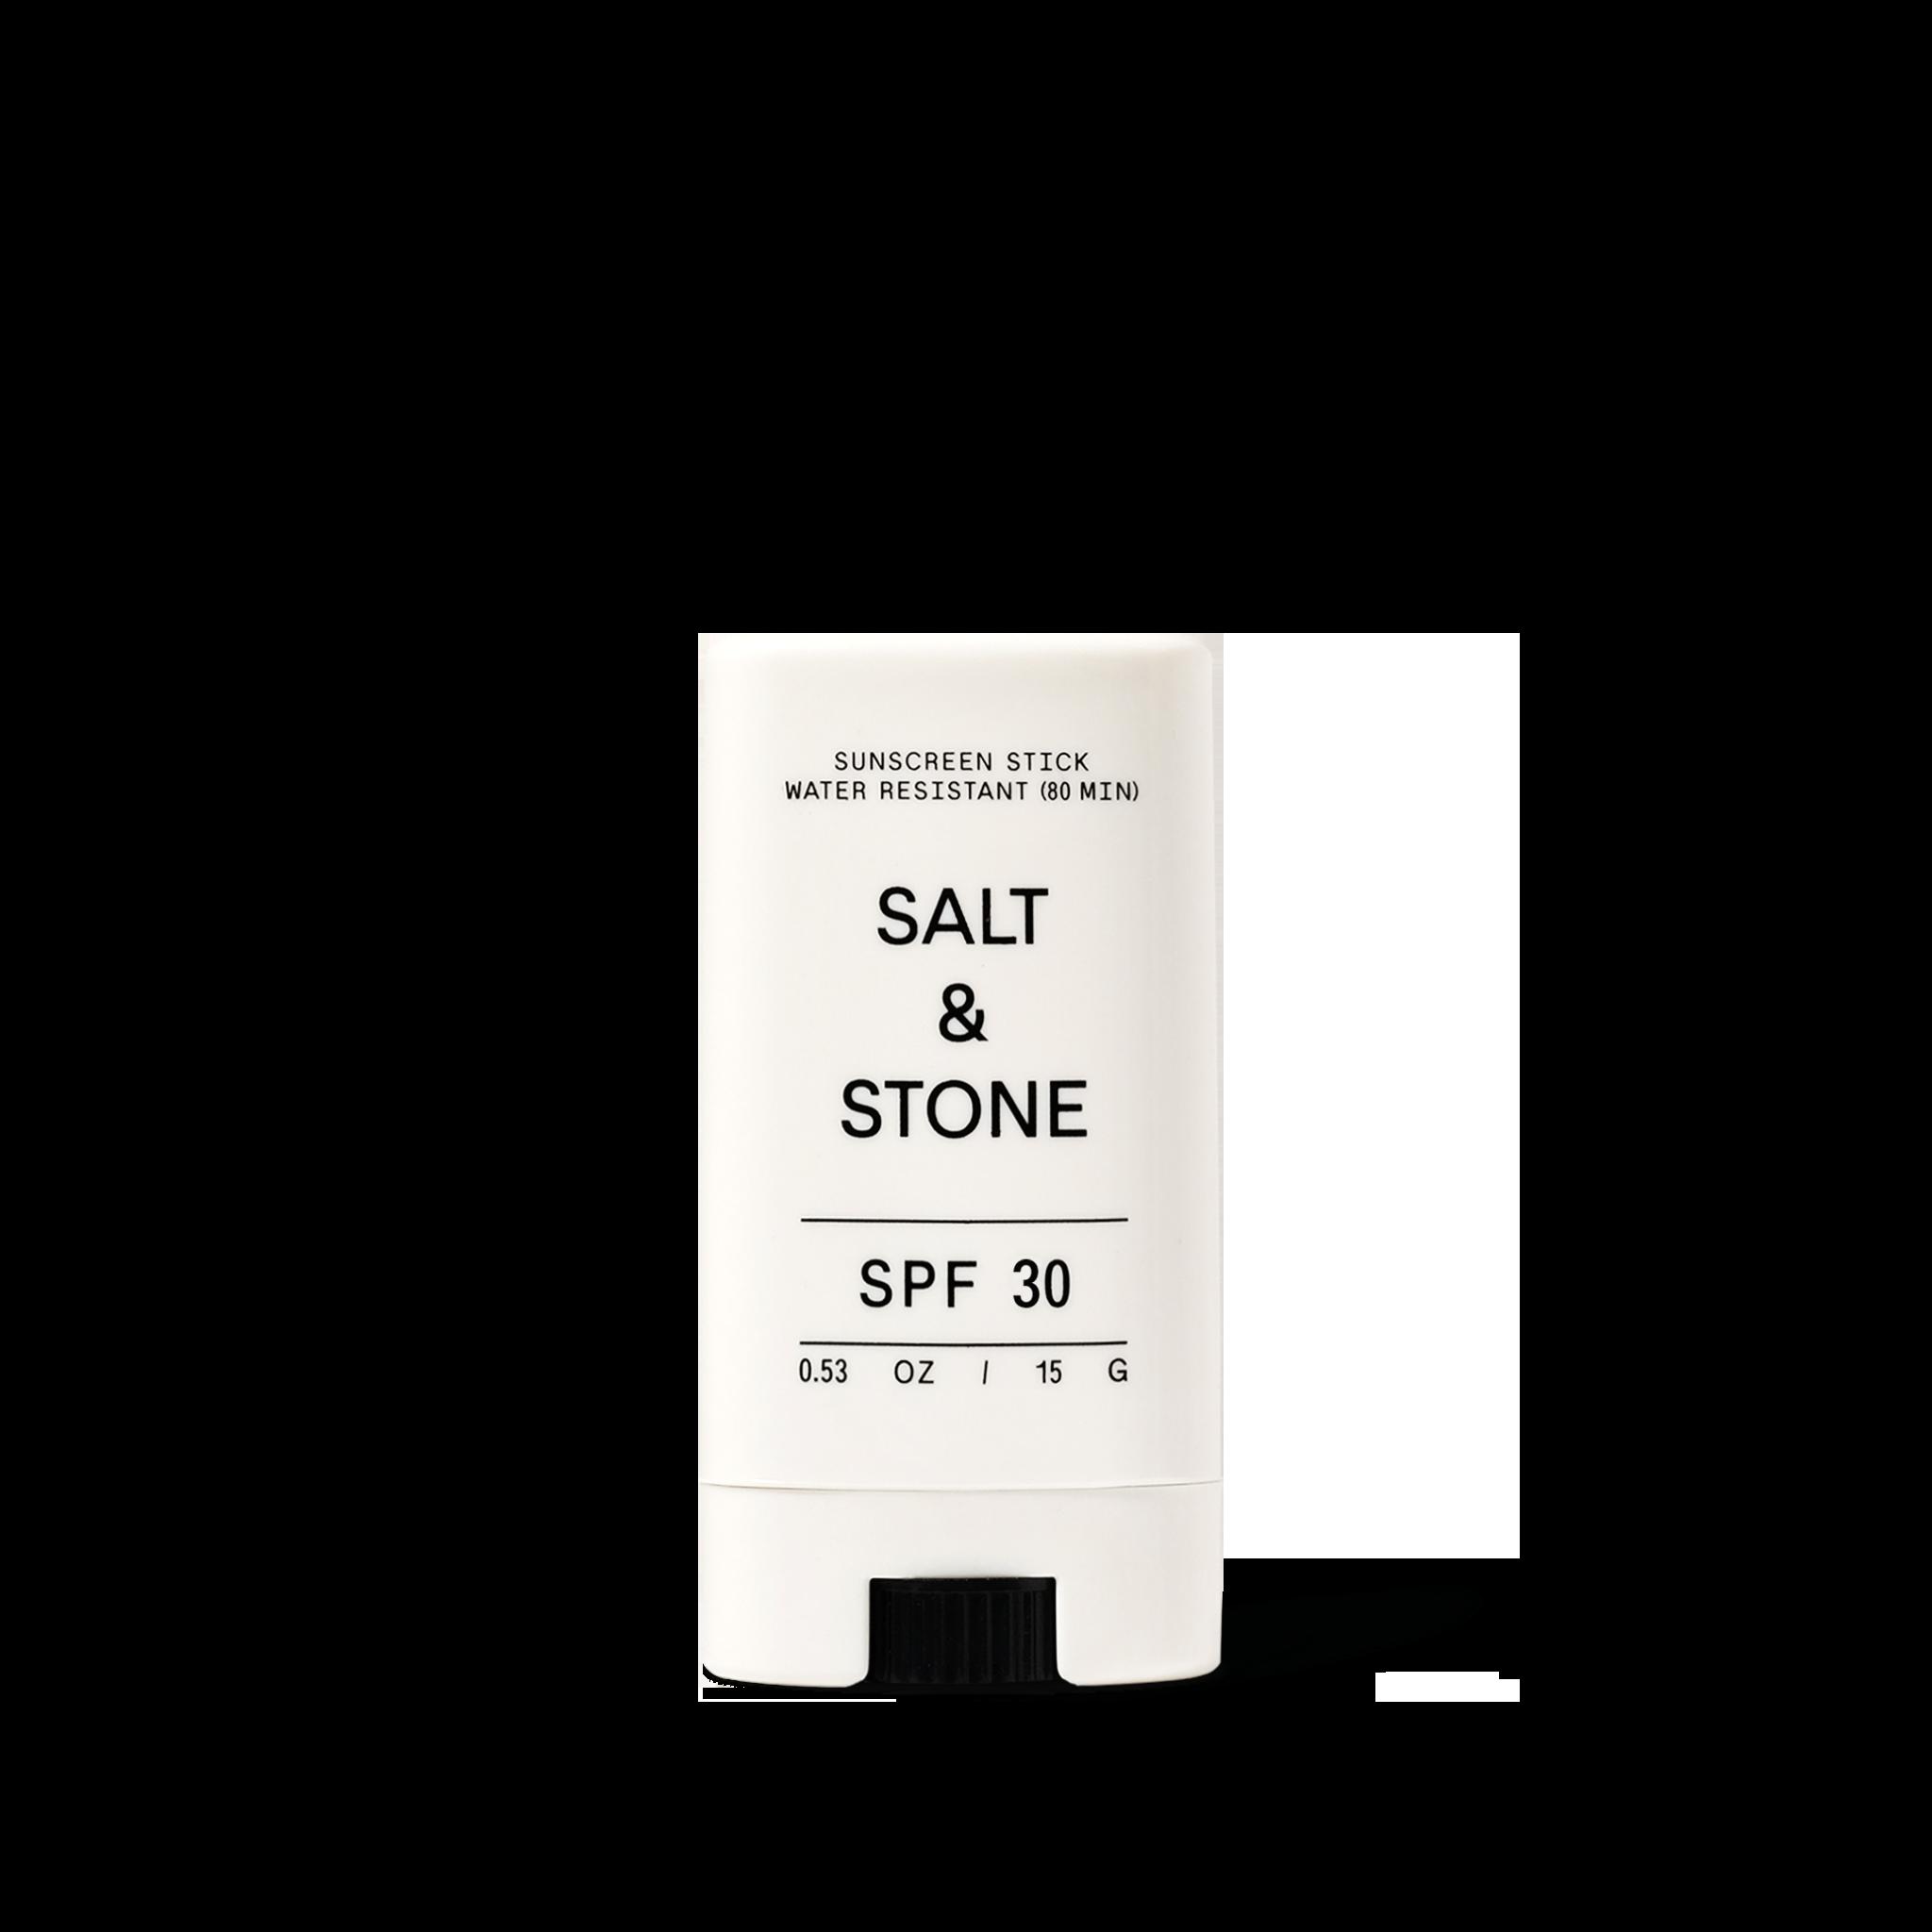 Salt & Stone SPF 30